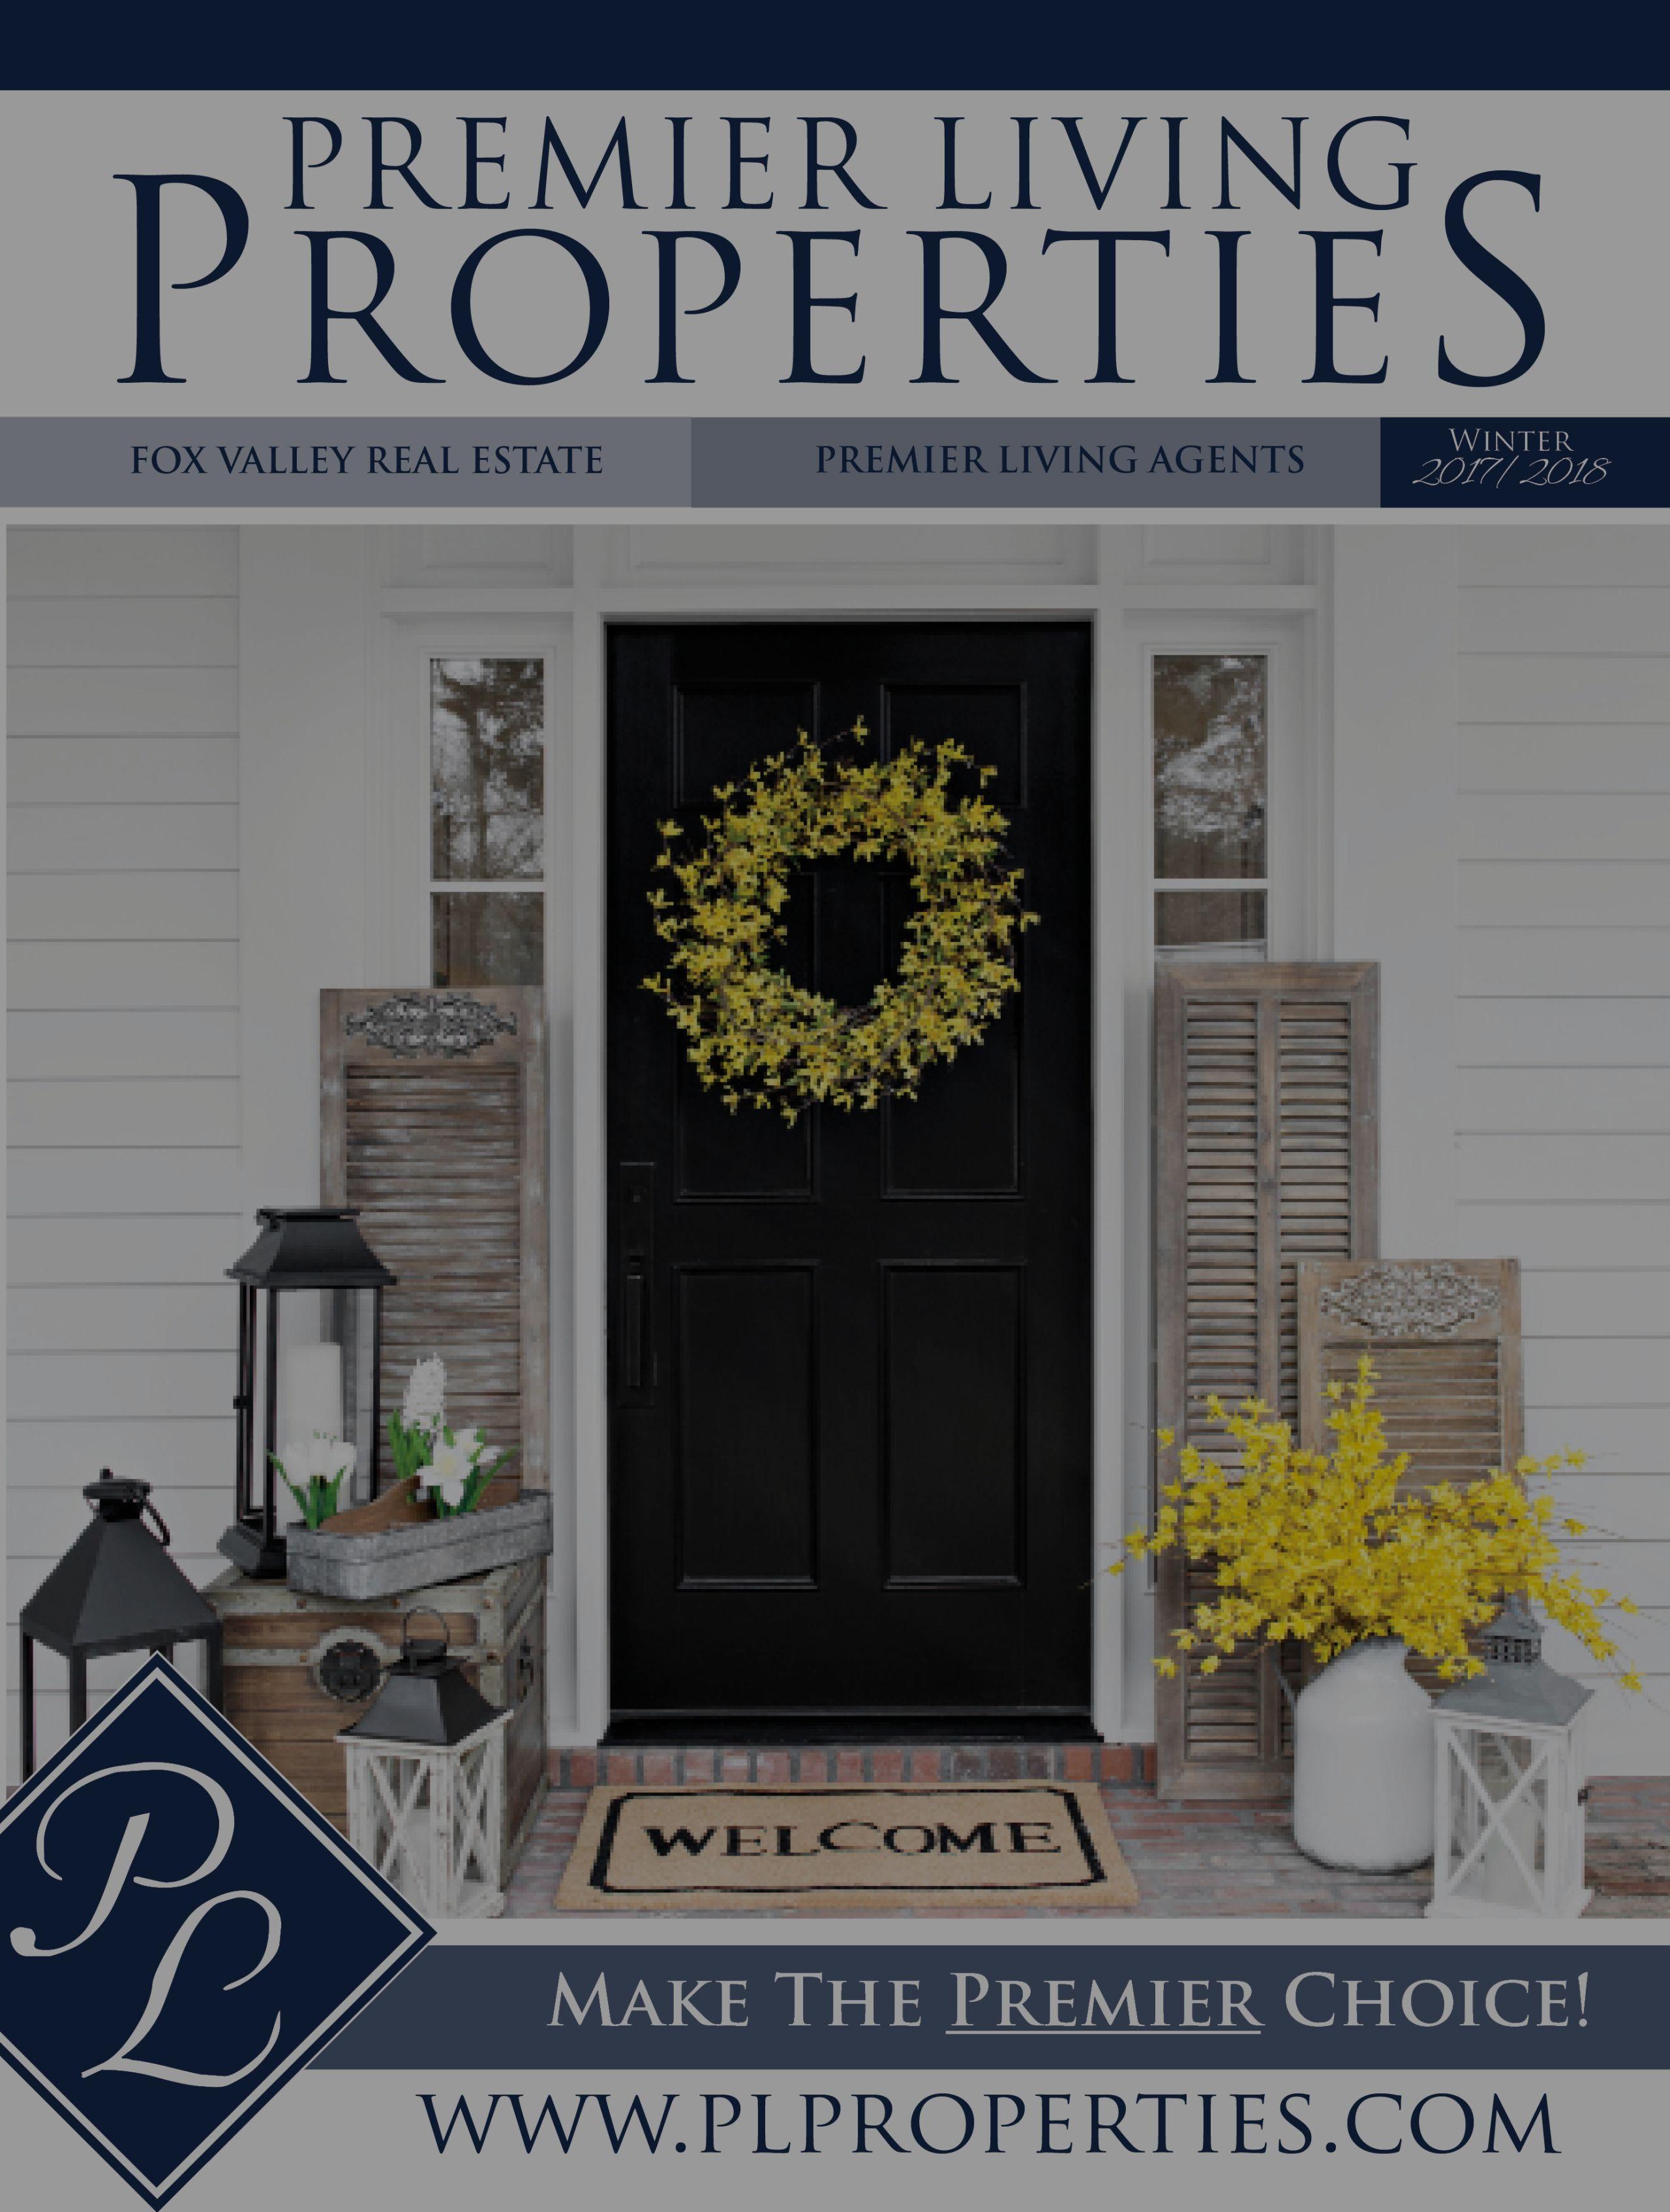 Premier Living Properties Winter 2017 Magazine